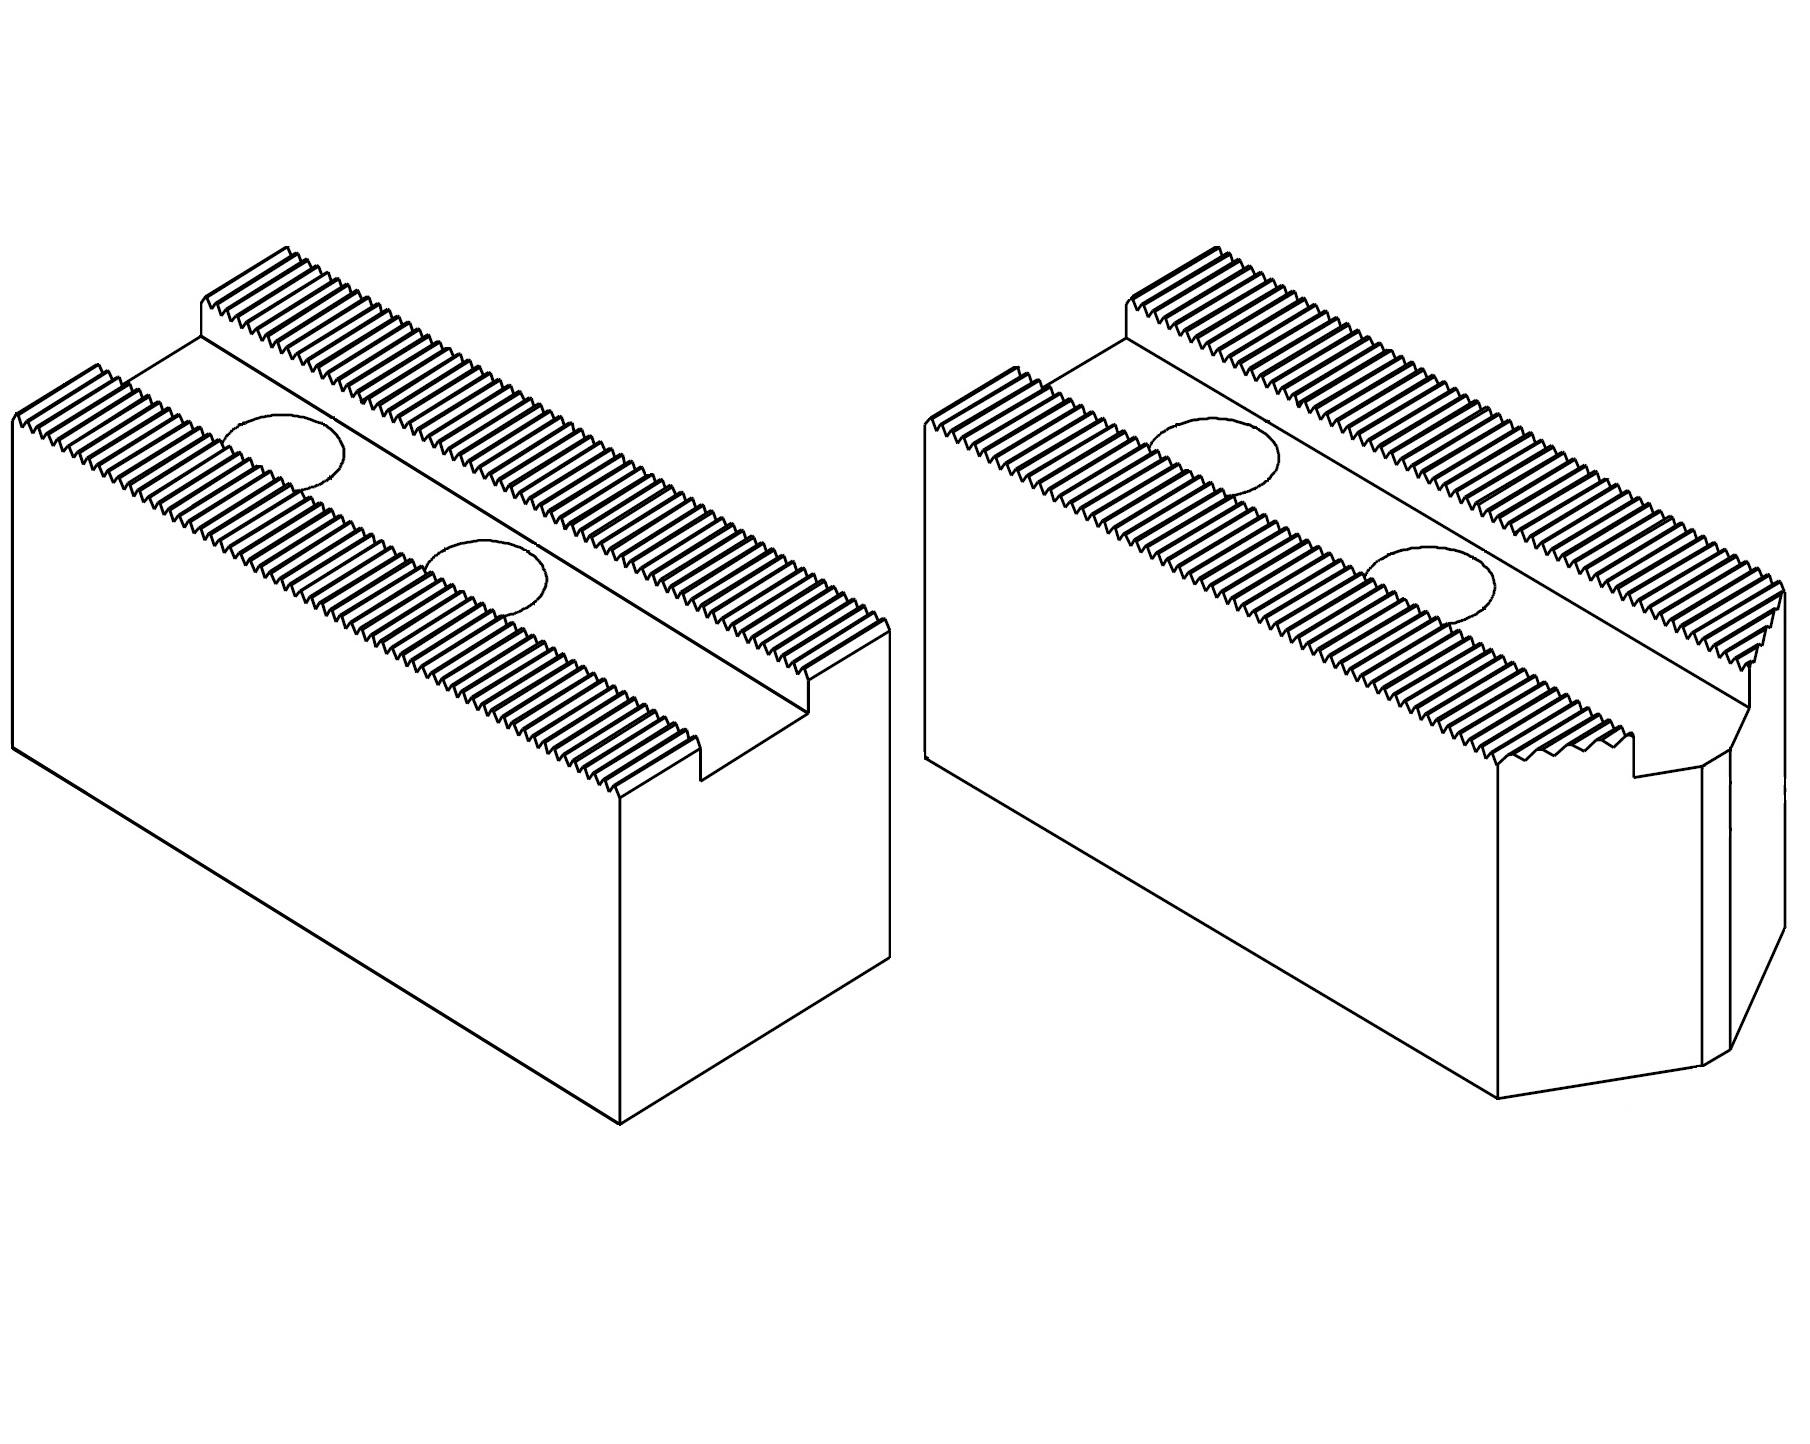 "Čelisti měkké 1/16""x90°, šířka drážky - 16 (sklíčidla pr. 250 - 315 mm)"